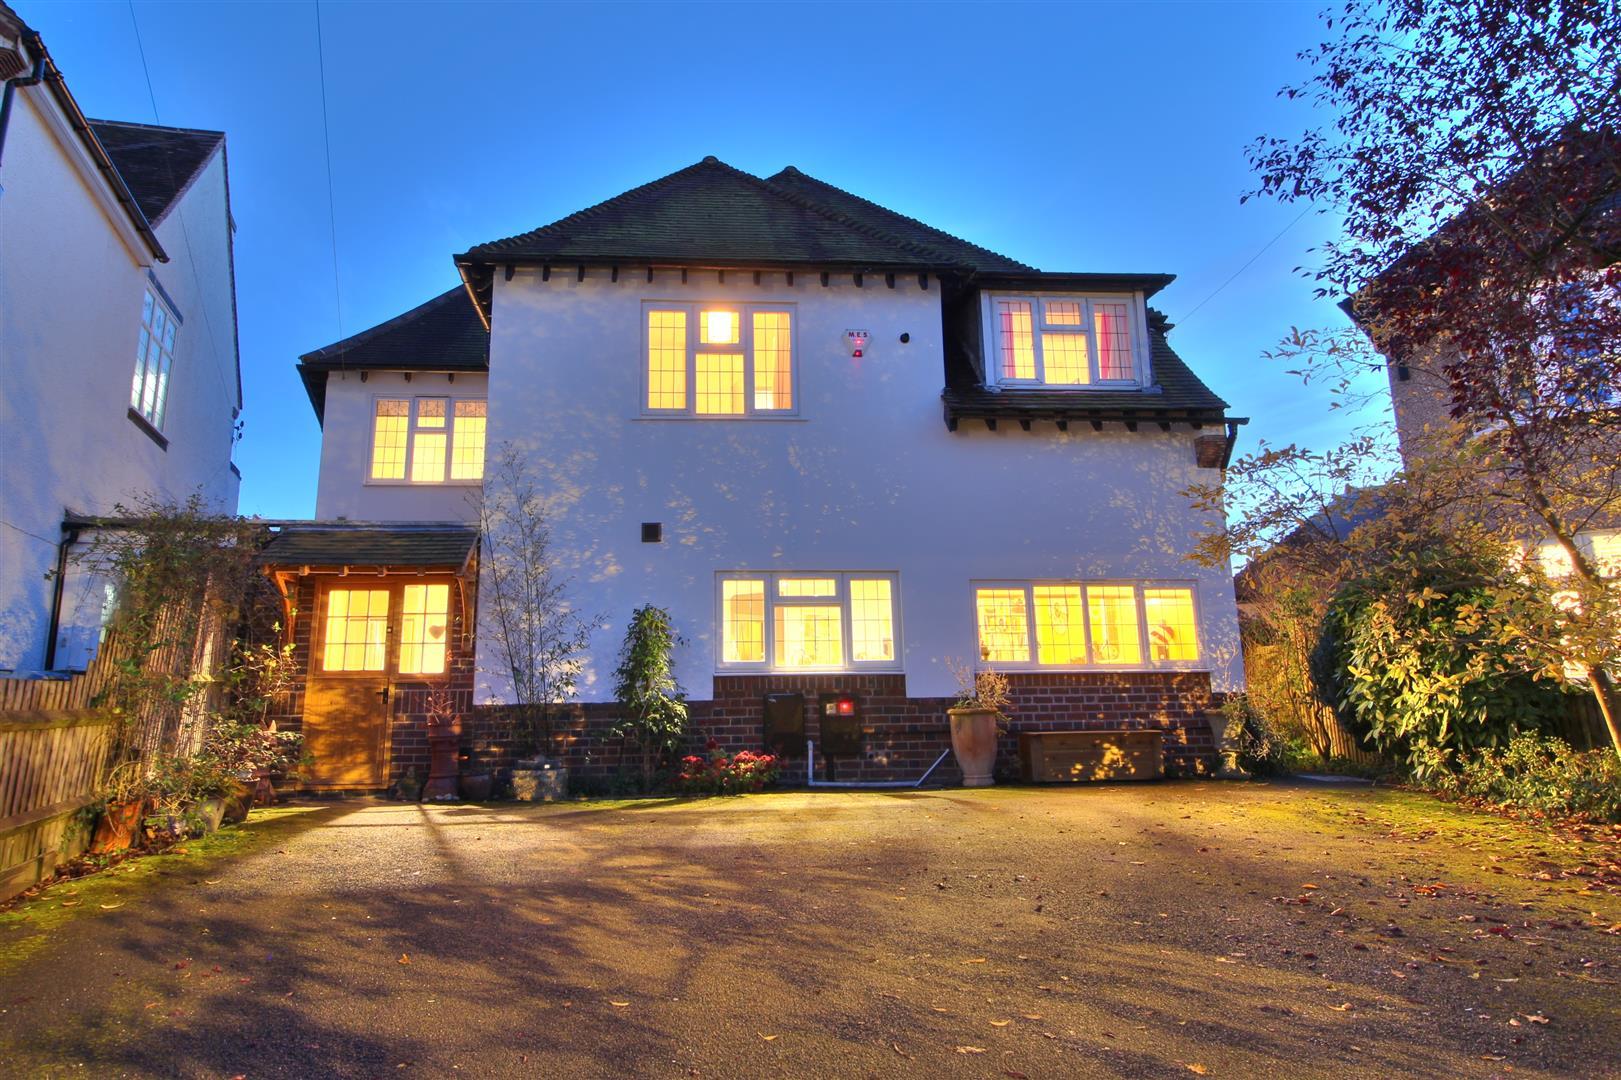 Complete Estate Agents Leamington Spa